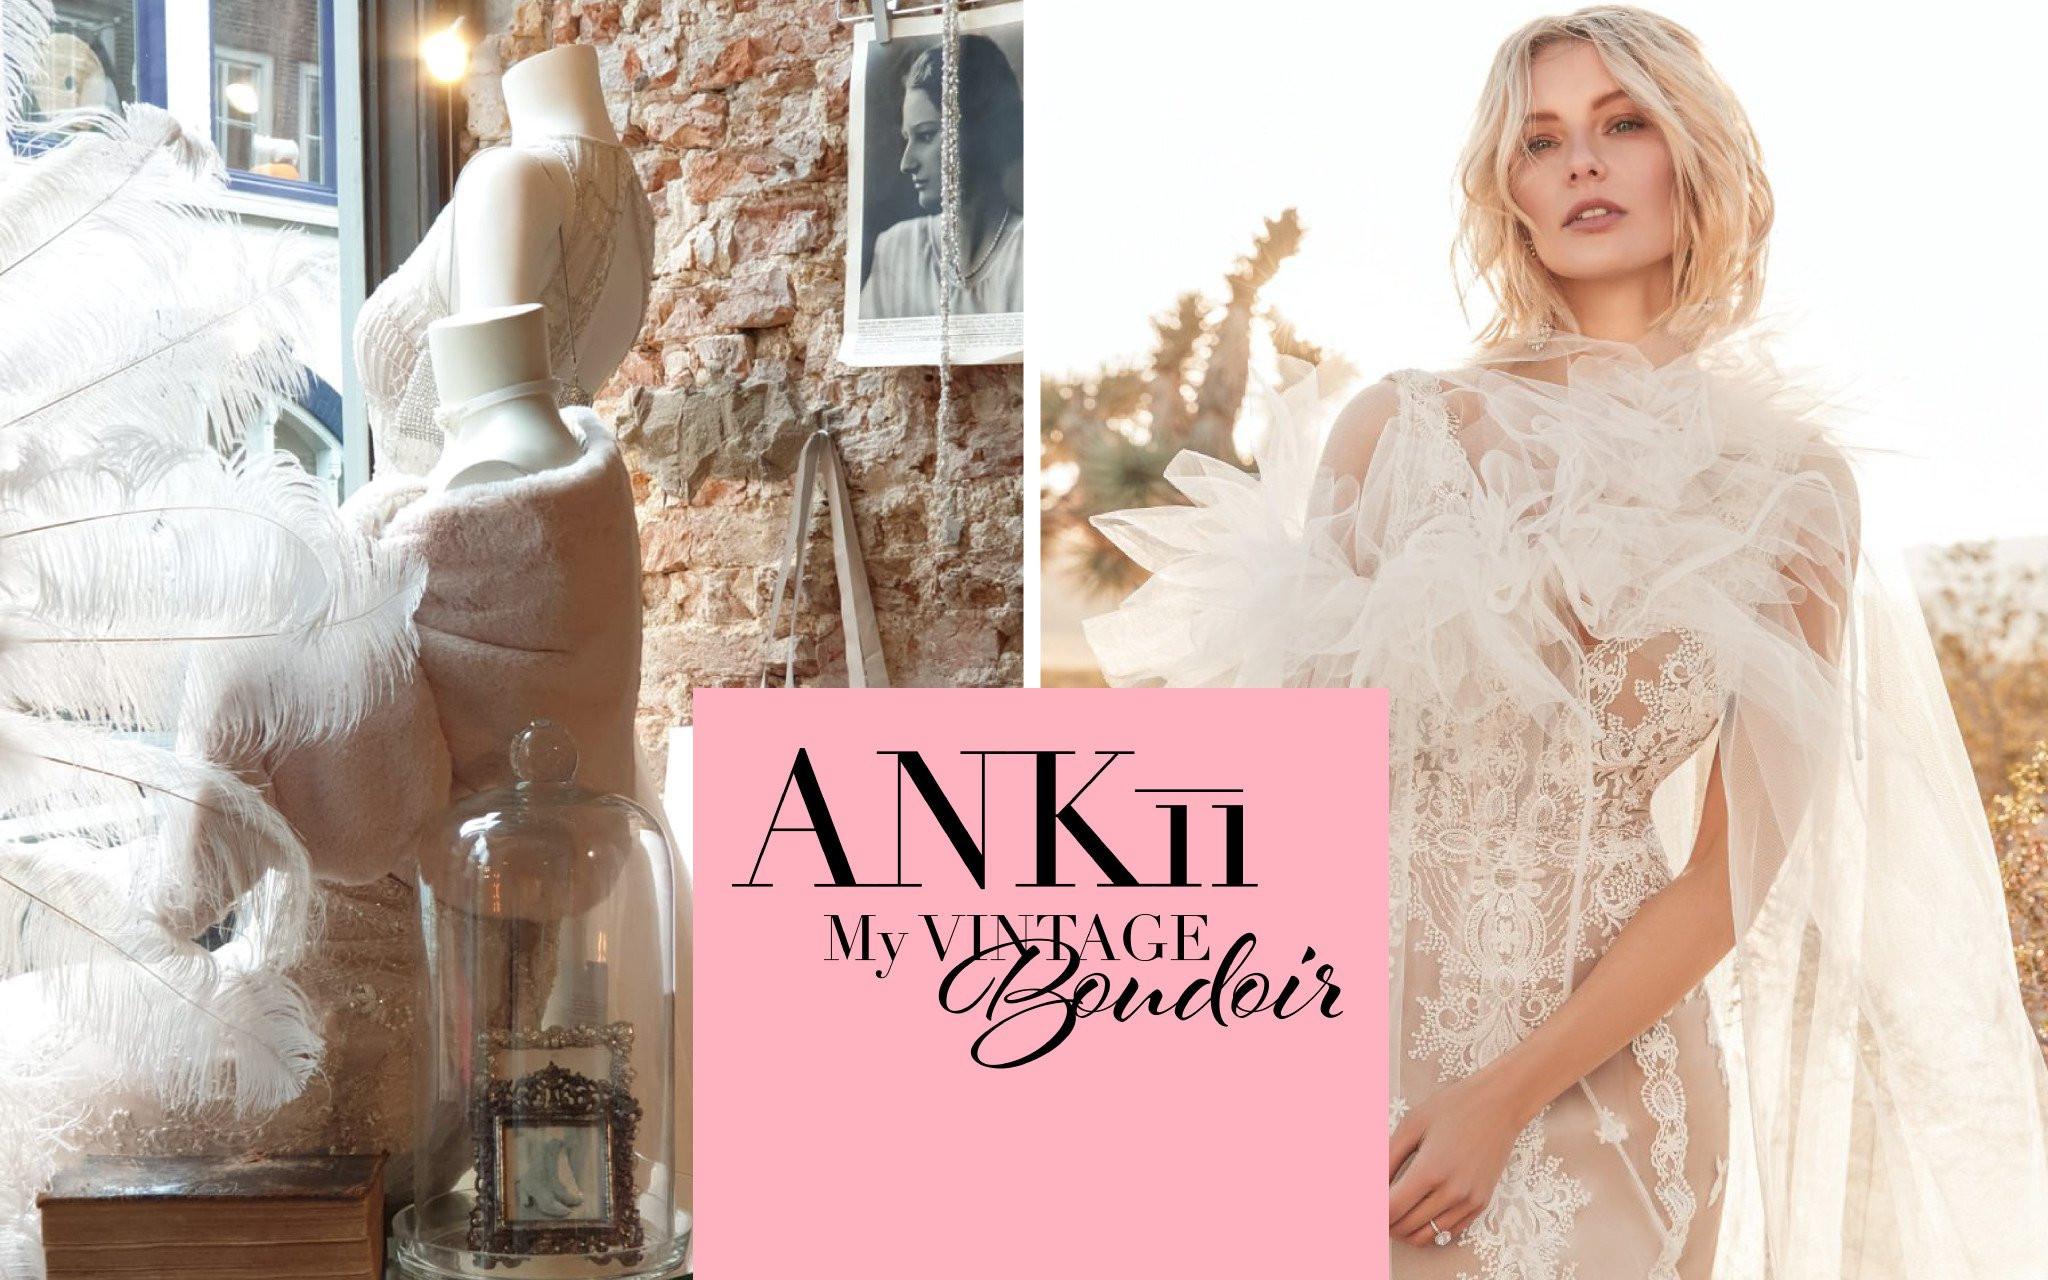 Ankii My Vintage Boudoir In Dordrecht Theperfectwedding Nl